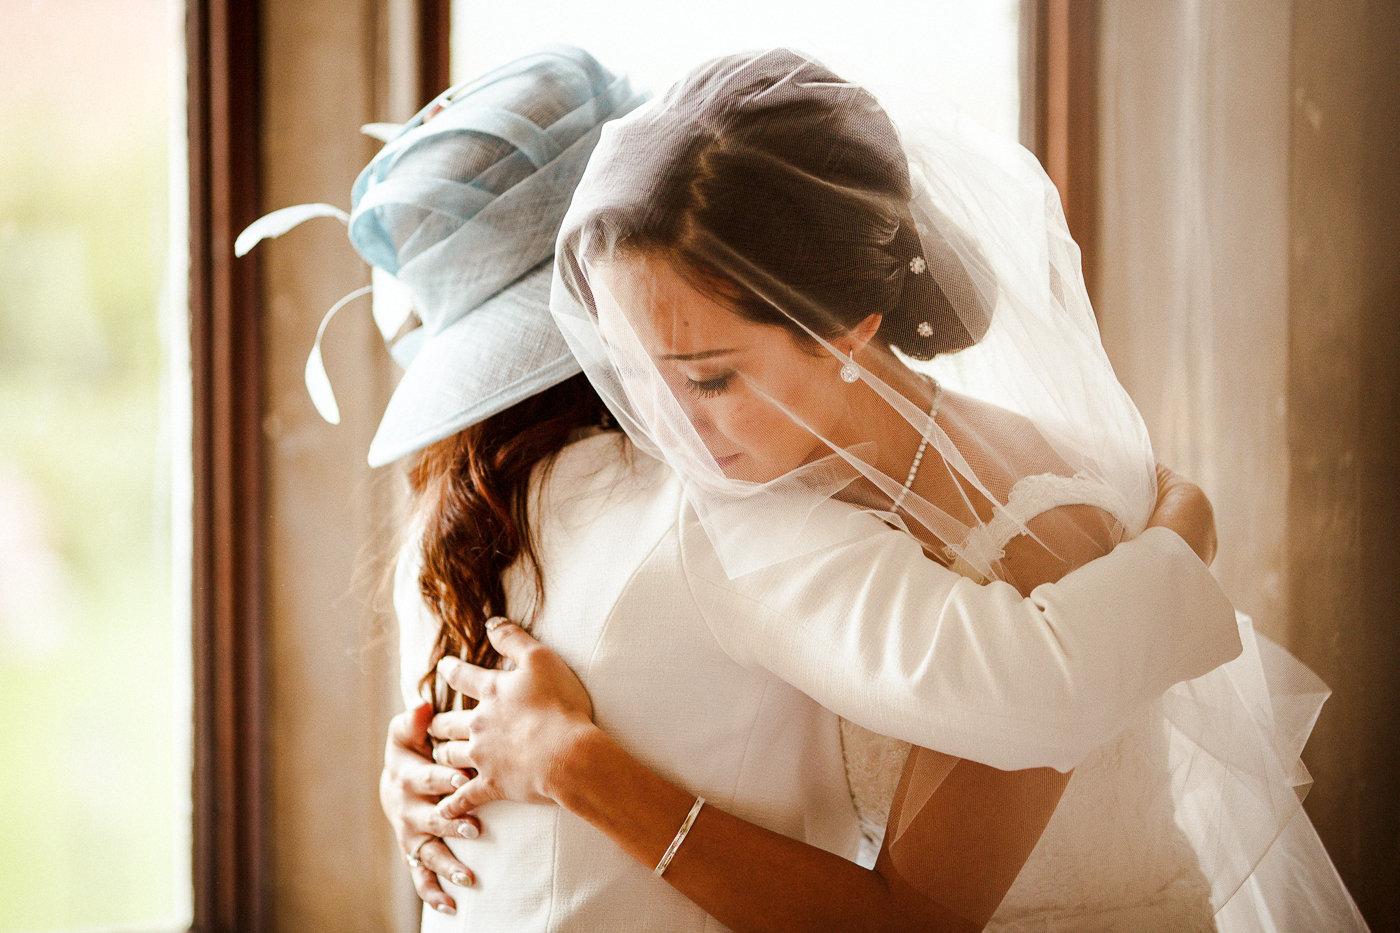 froyle-park-wedding-photography-12.jpg